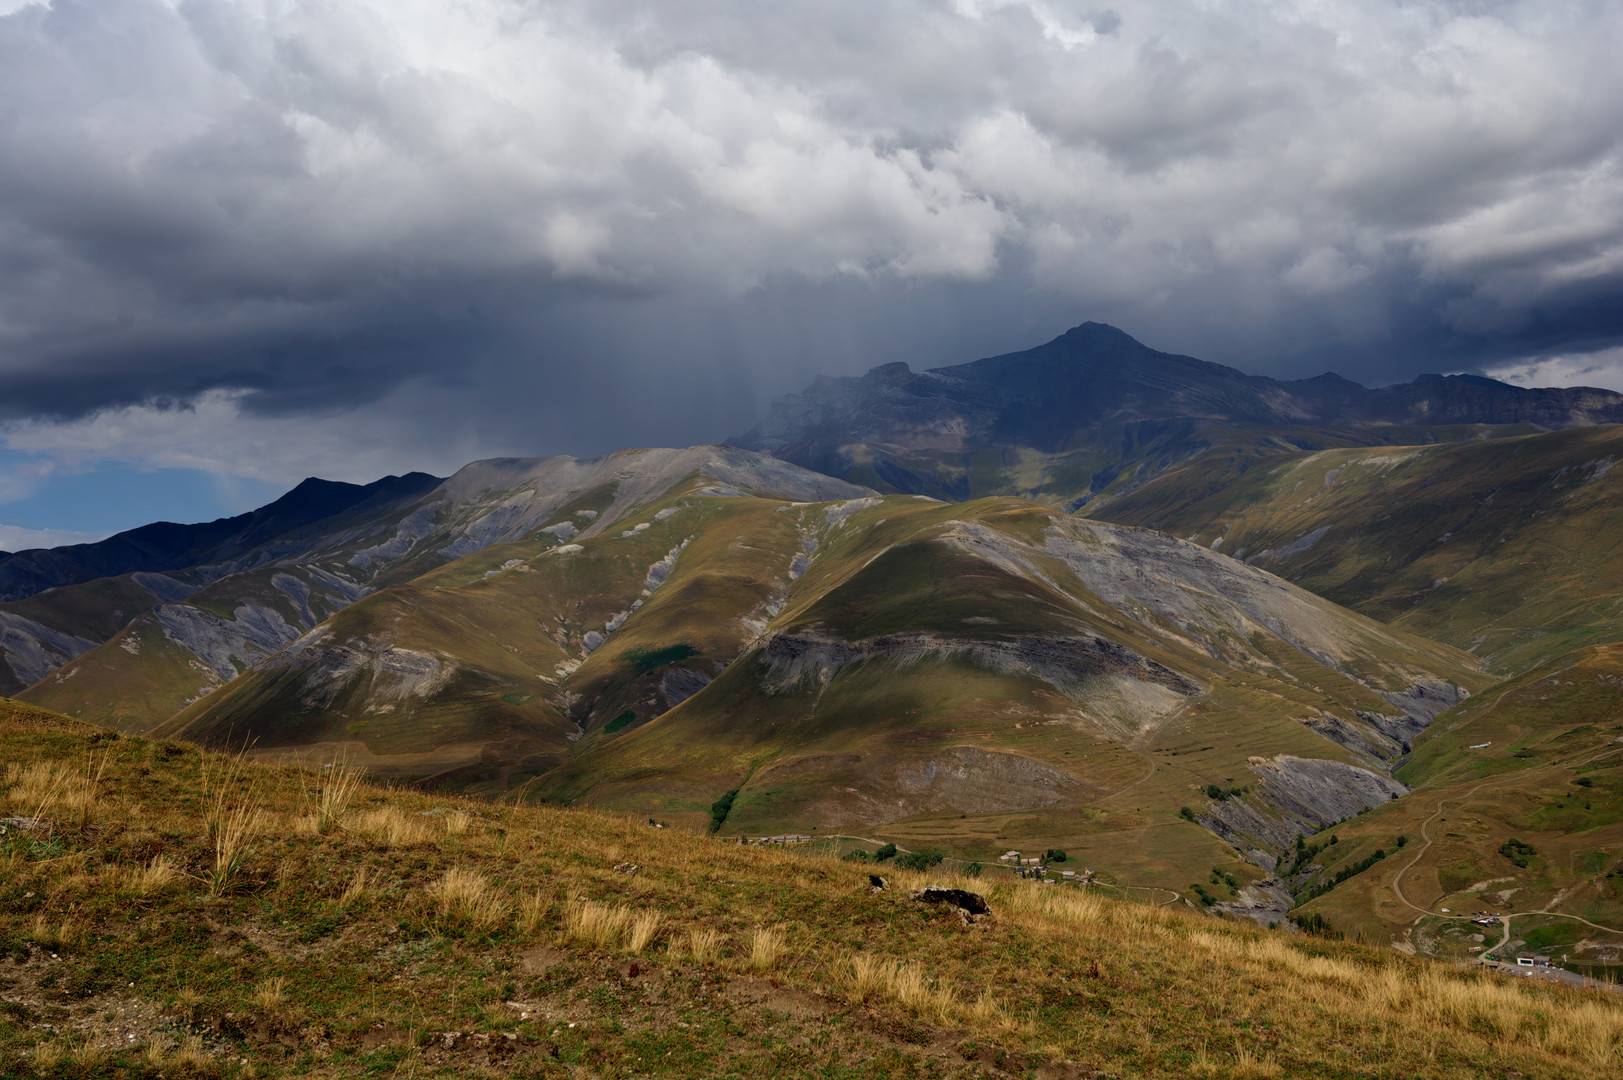 Storm over La Signal de la Grave